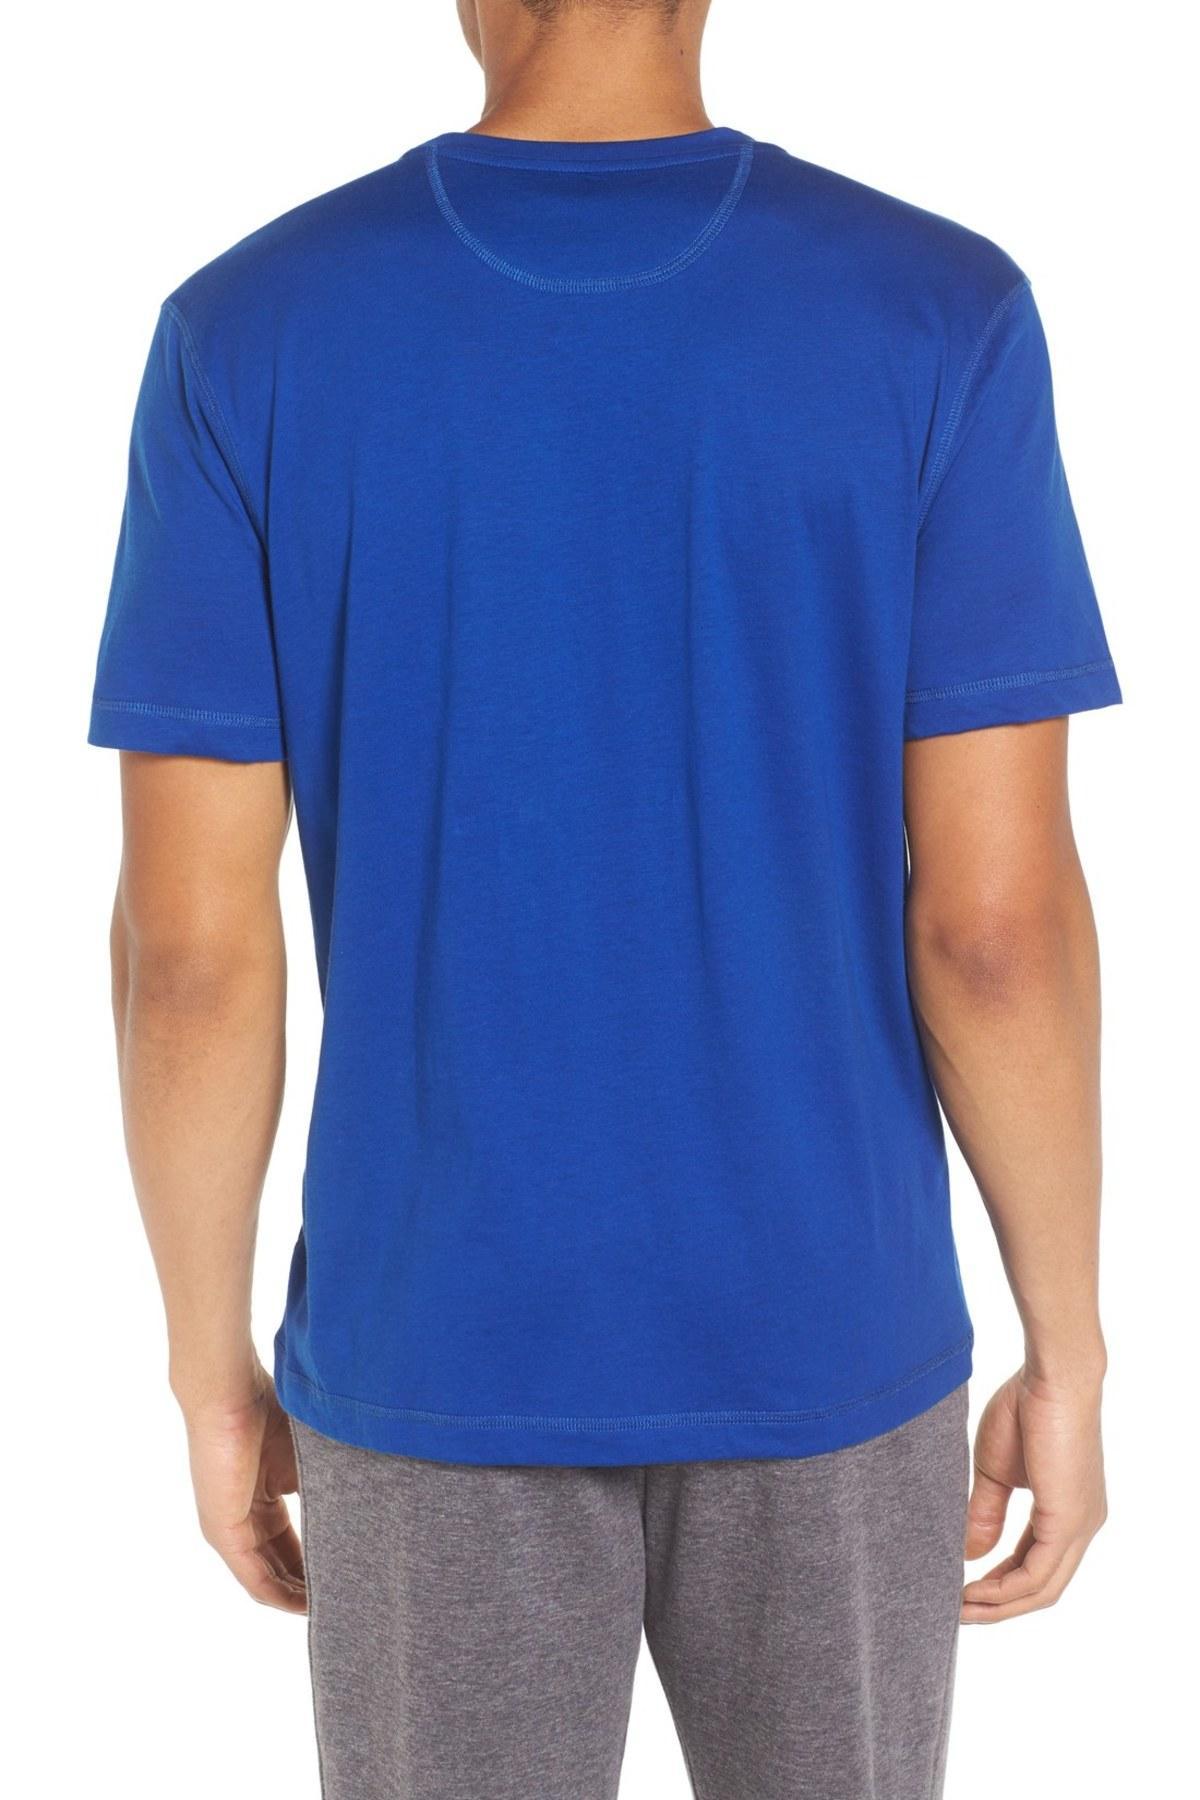 Lyst daniel buchler peruvian pima cotton t shirt in blue for Peruvian cotton t shirts